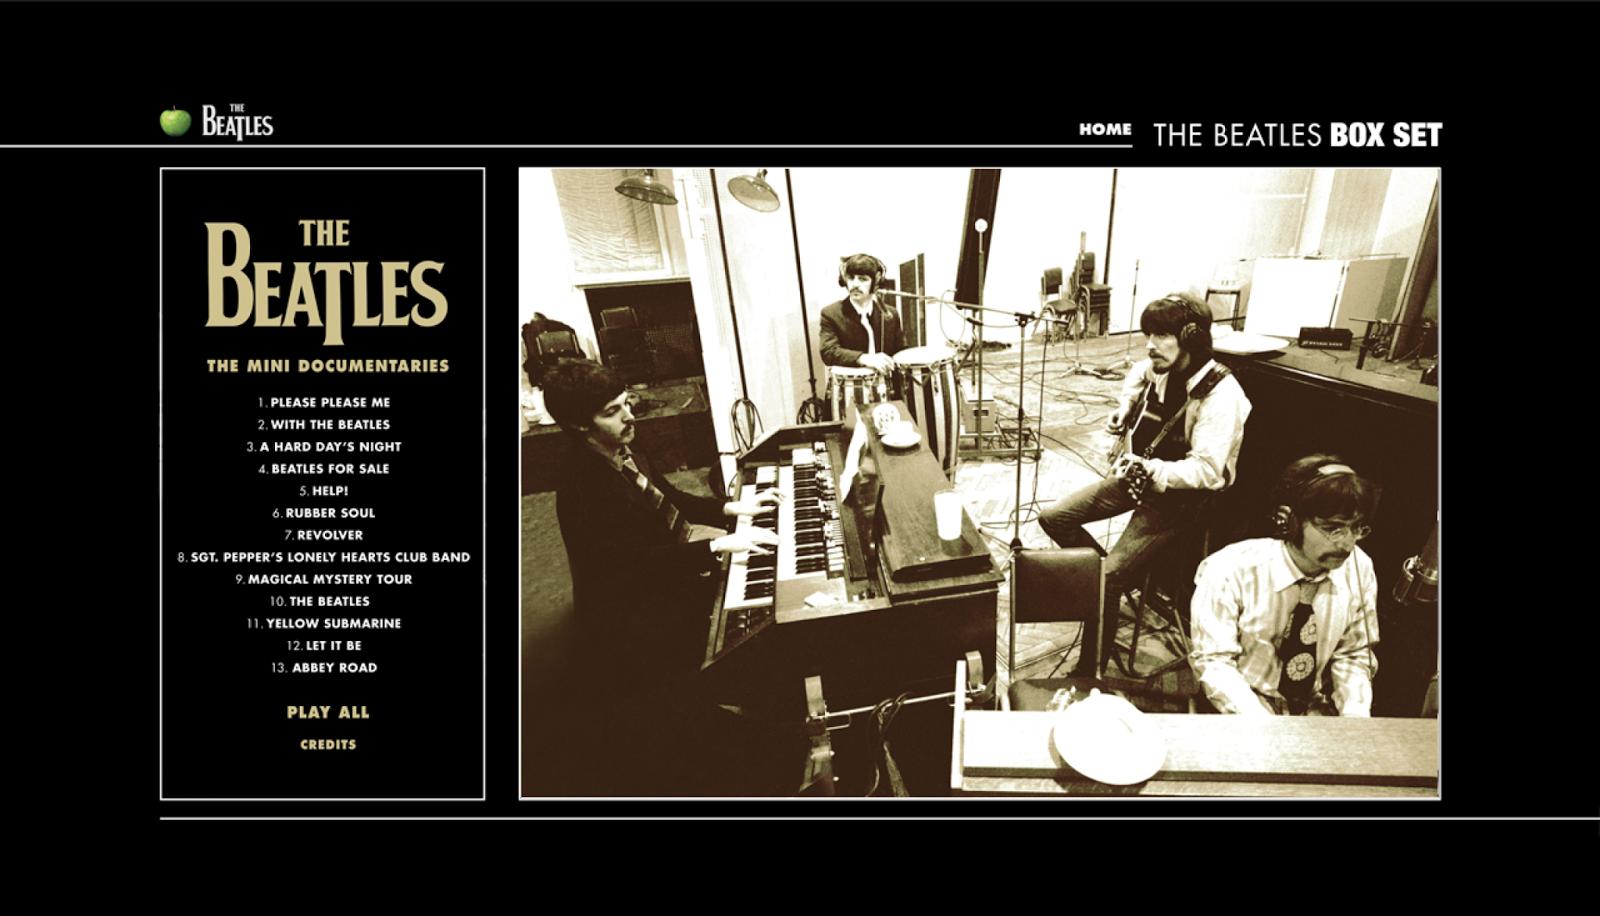 the beatles the beatles box set itunes plus aac m4a hardrivezone. Black Bedroom Furniture Sets. Home Design Ideas